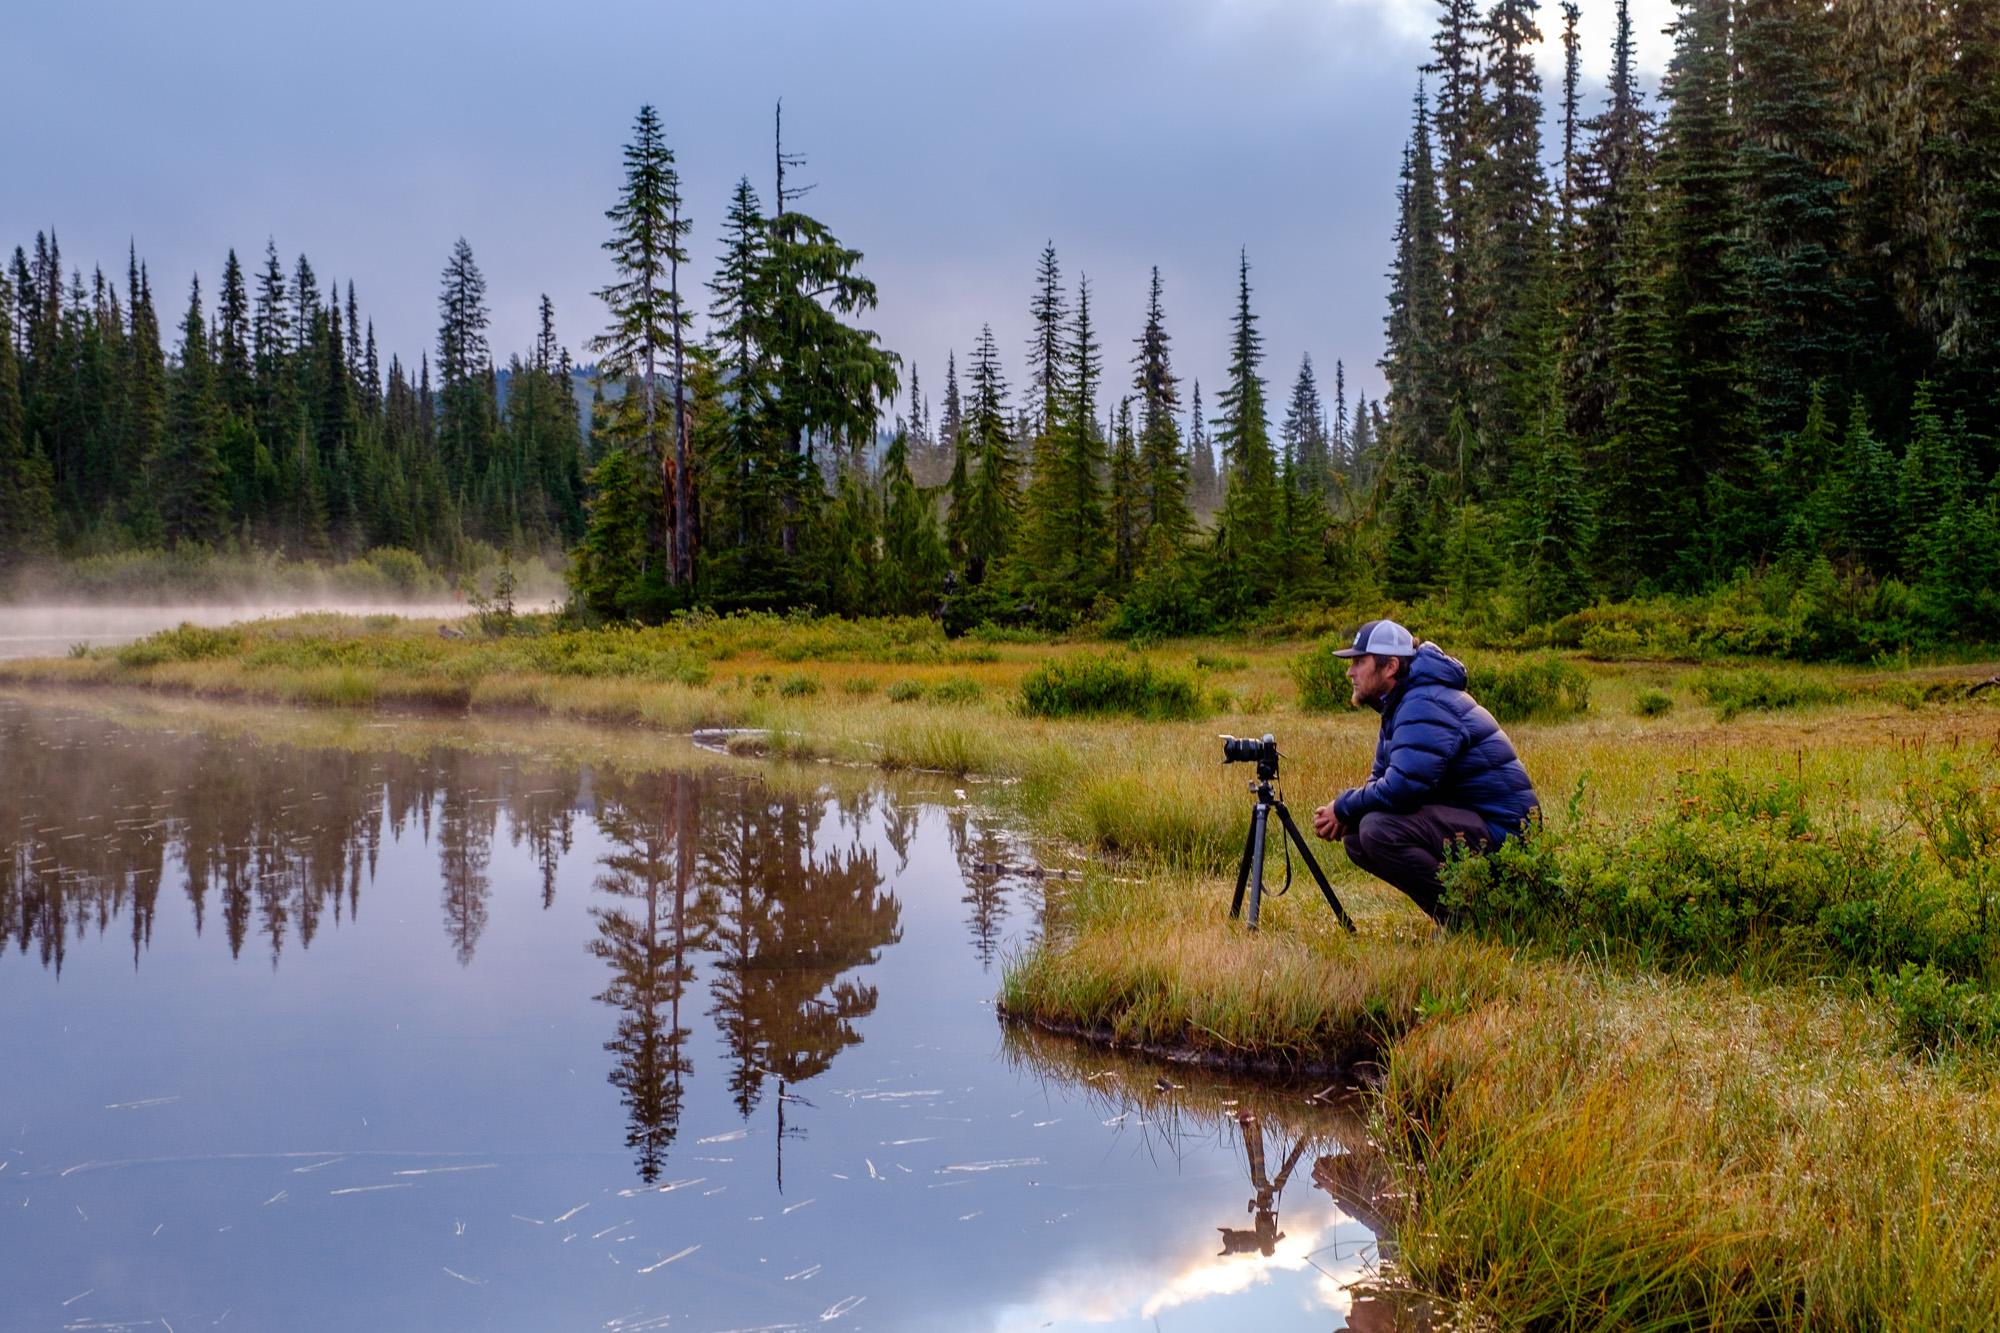 A photographer's life.